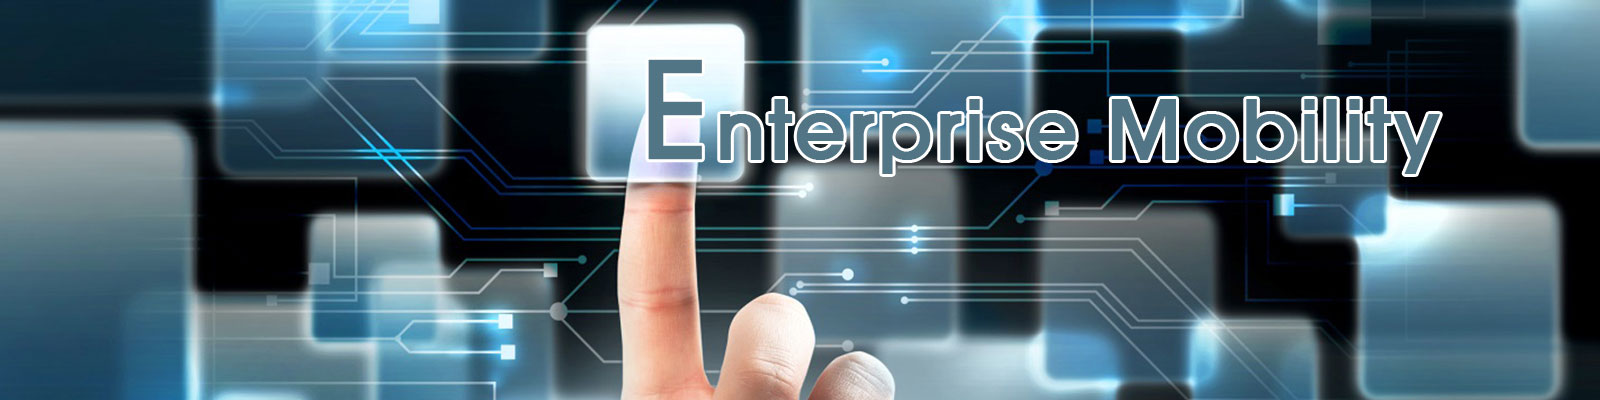 enterprise mobile app development cost